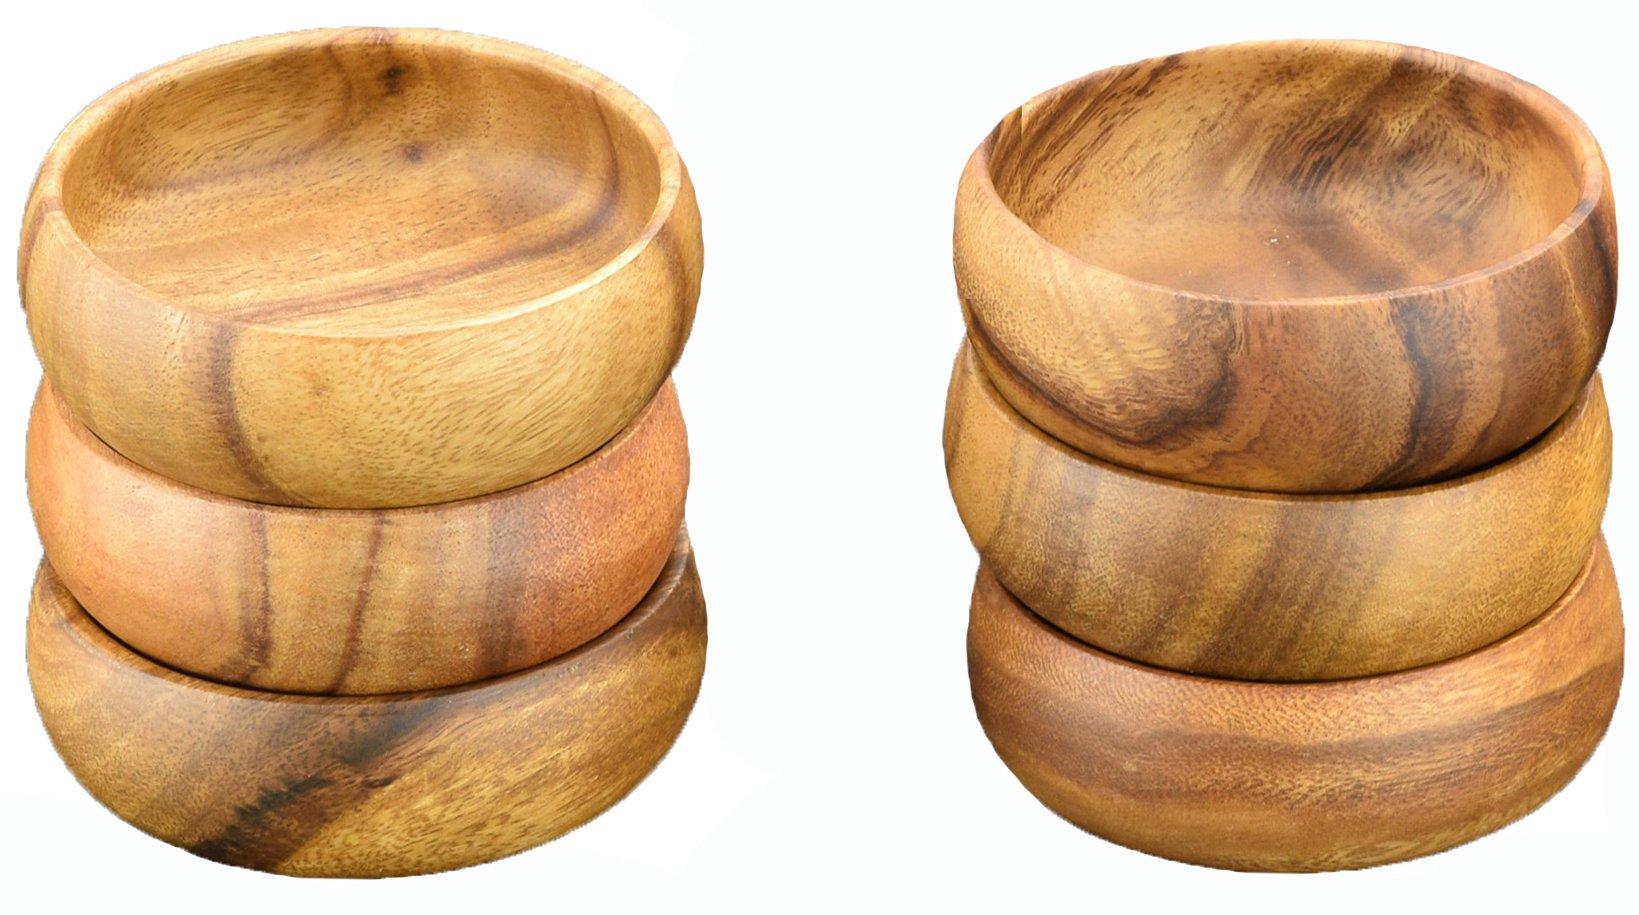 Acaciaware Acacia Wood Round Salad Bowls, Dipping and Nut Bowls, 6-inch D by 3-inch, Set of 6